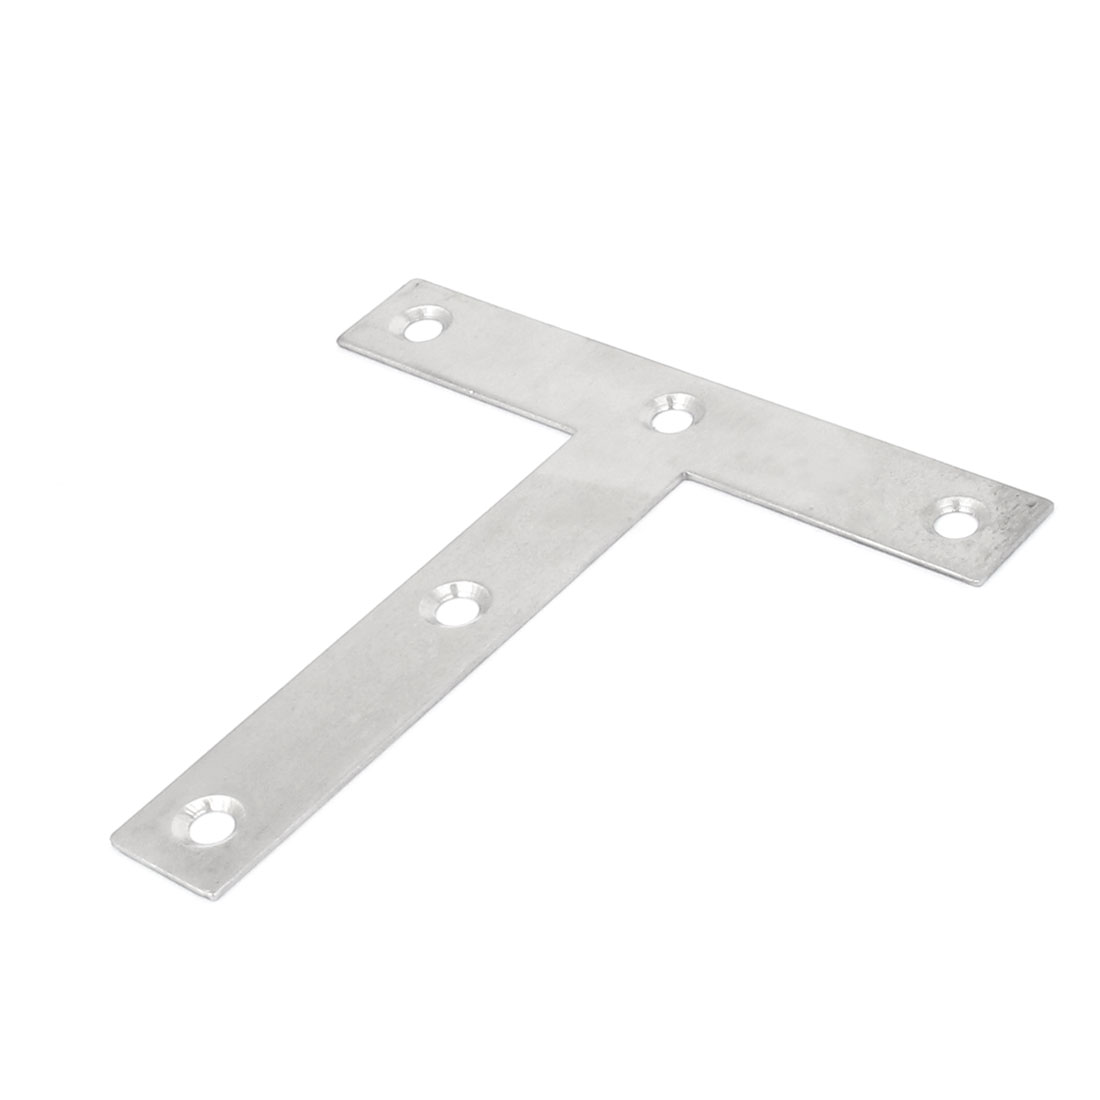 120mmx120mm Flat T Shape Corner Brace Mending Plate Angle Bracket